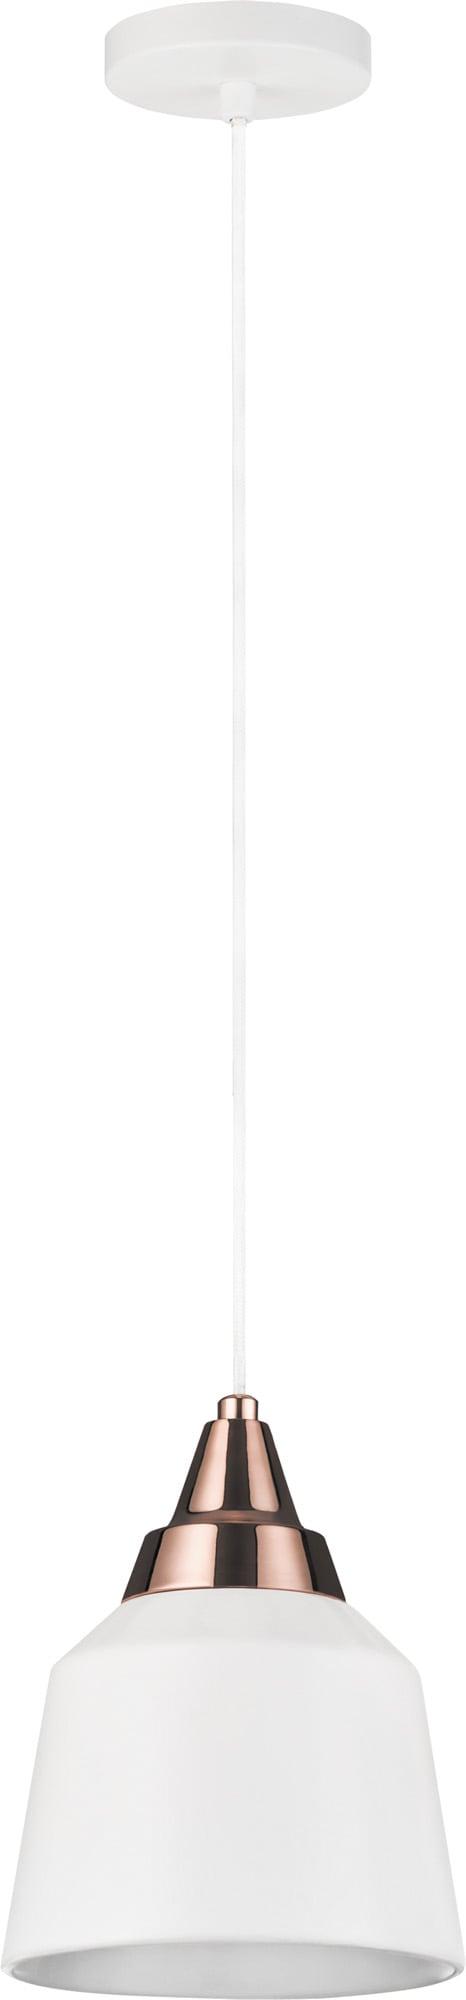 Glass pendant lamp Yoko in white E27 60W